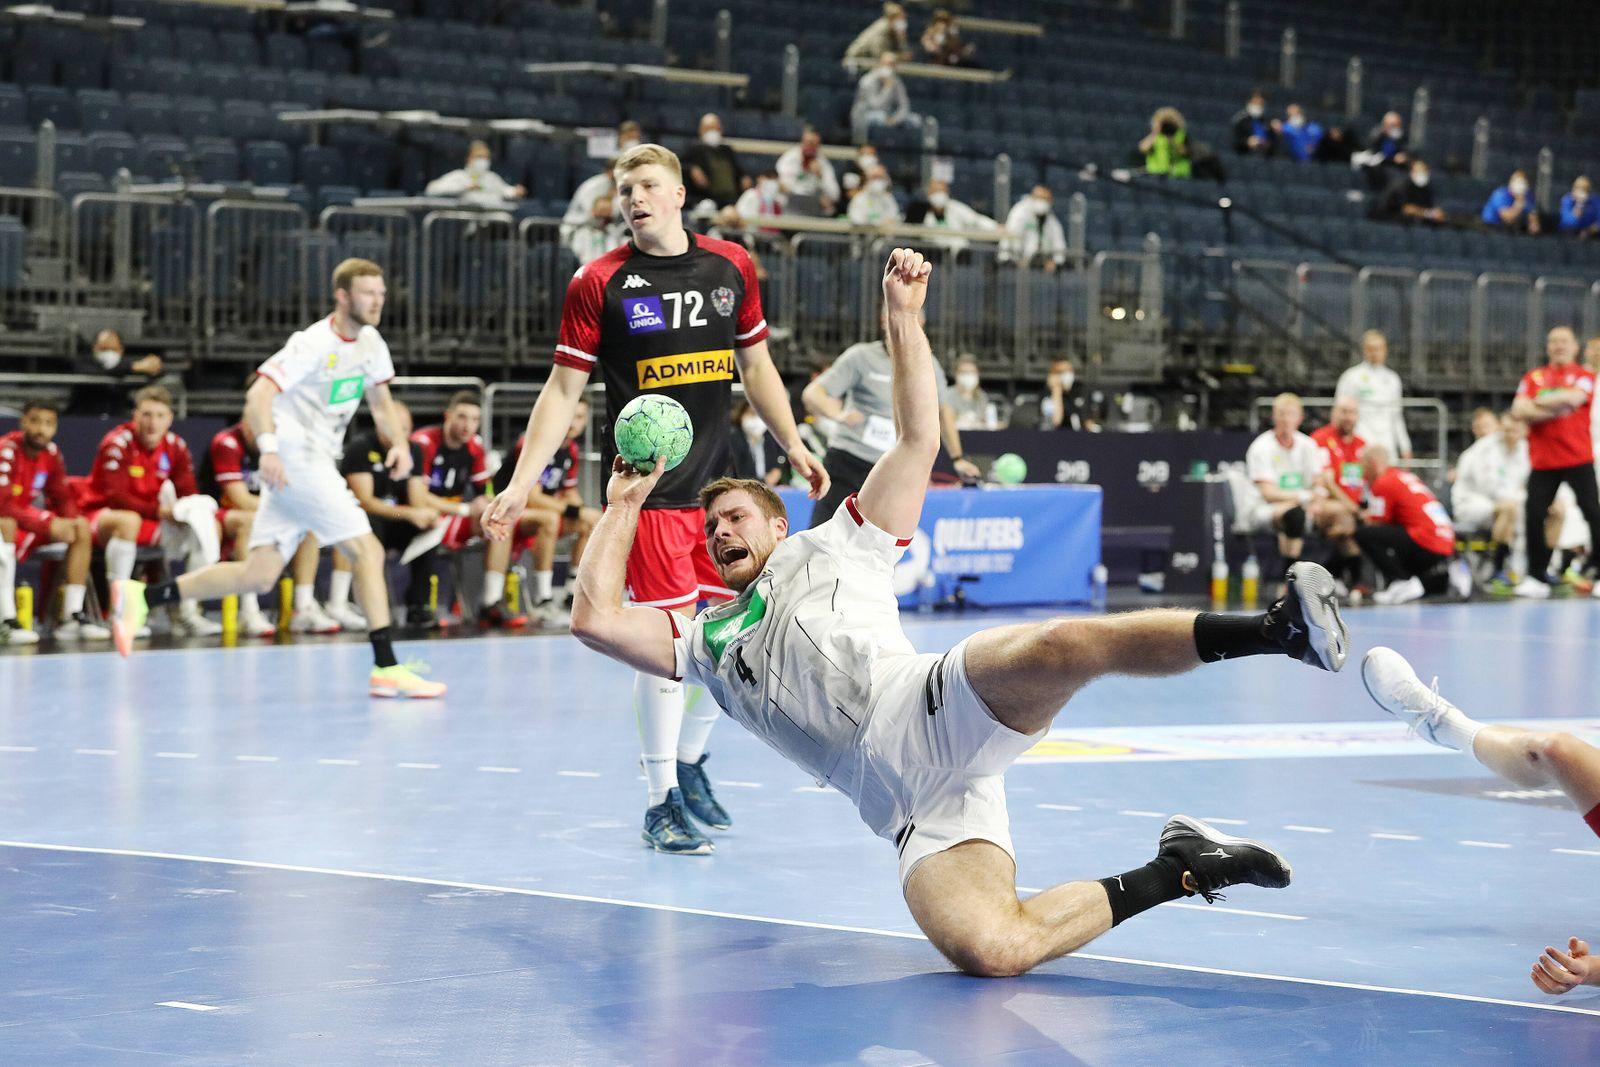 Deutschland vs. Österreich, Handball Länderspiel, EM-Qualifikation, links: Johannes Golla (D) Lanxessarena Köln, 10.01.